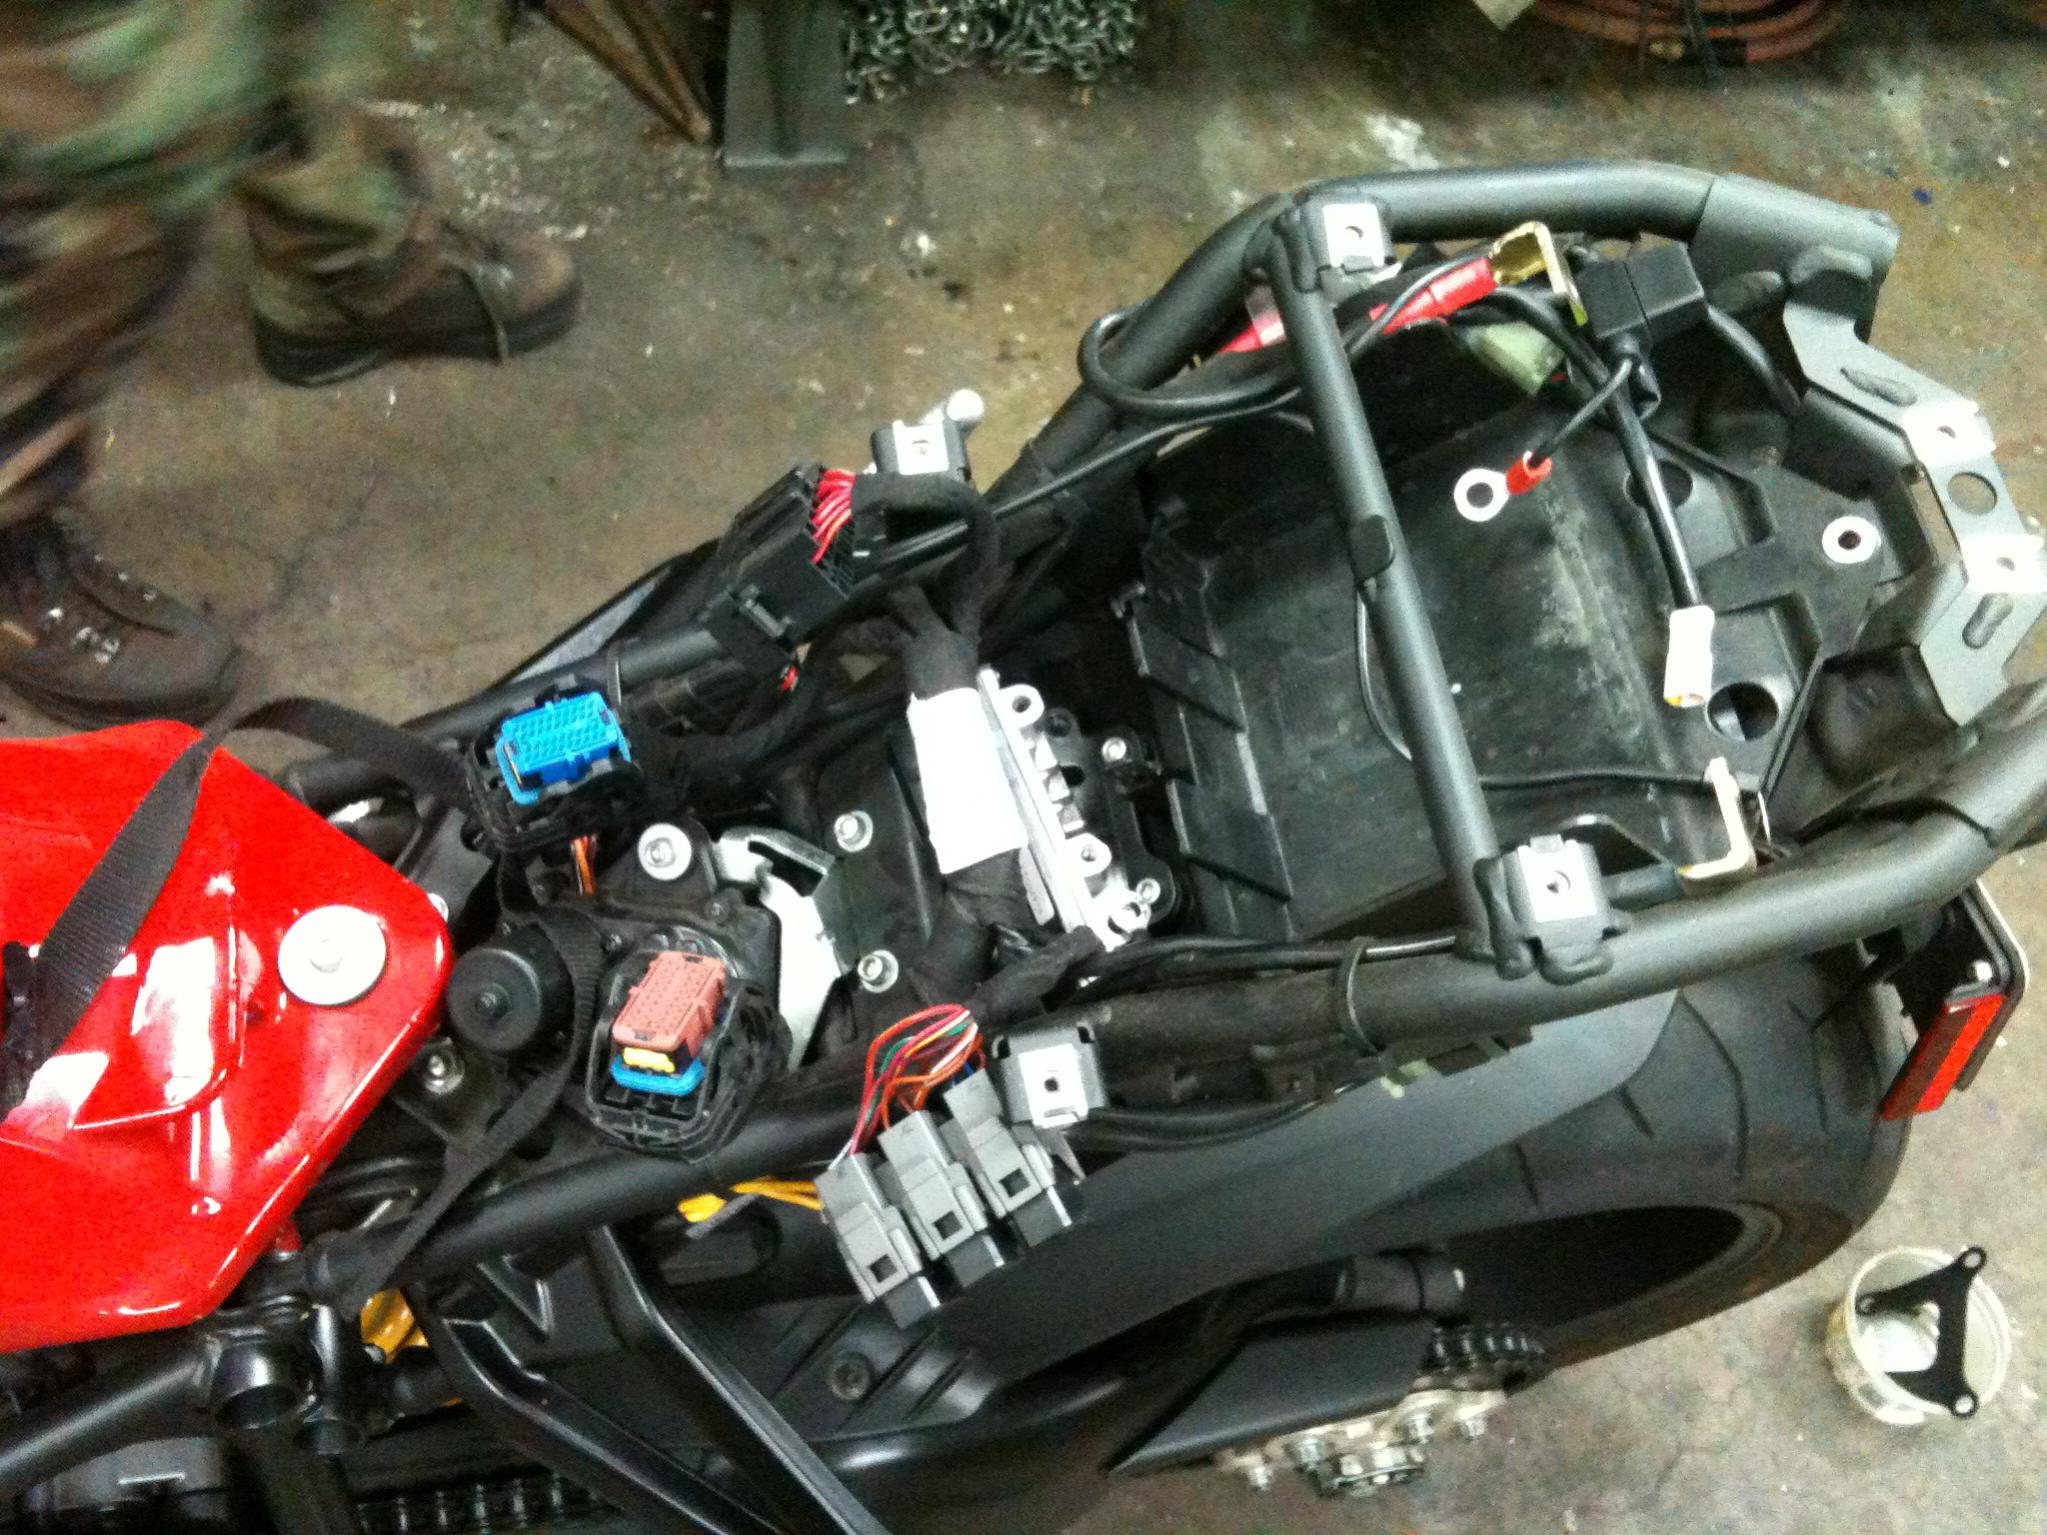 ducati fuse box diagram detailed schematic diagrams rh 4rmotorsports com Ducati 959 Ducati 996